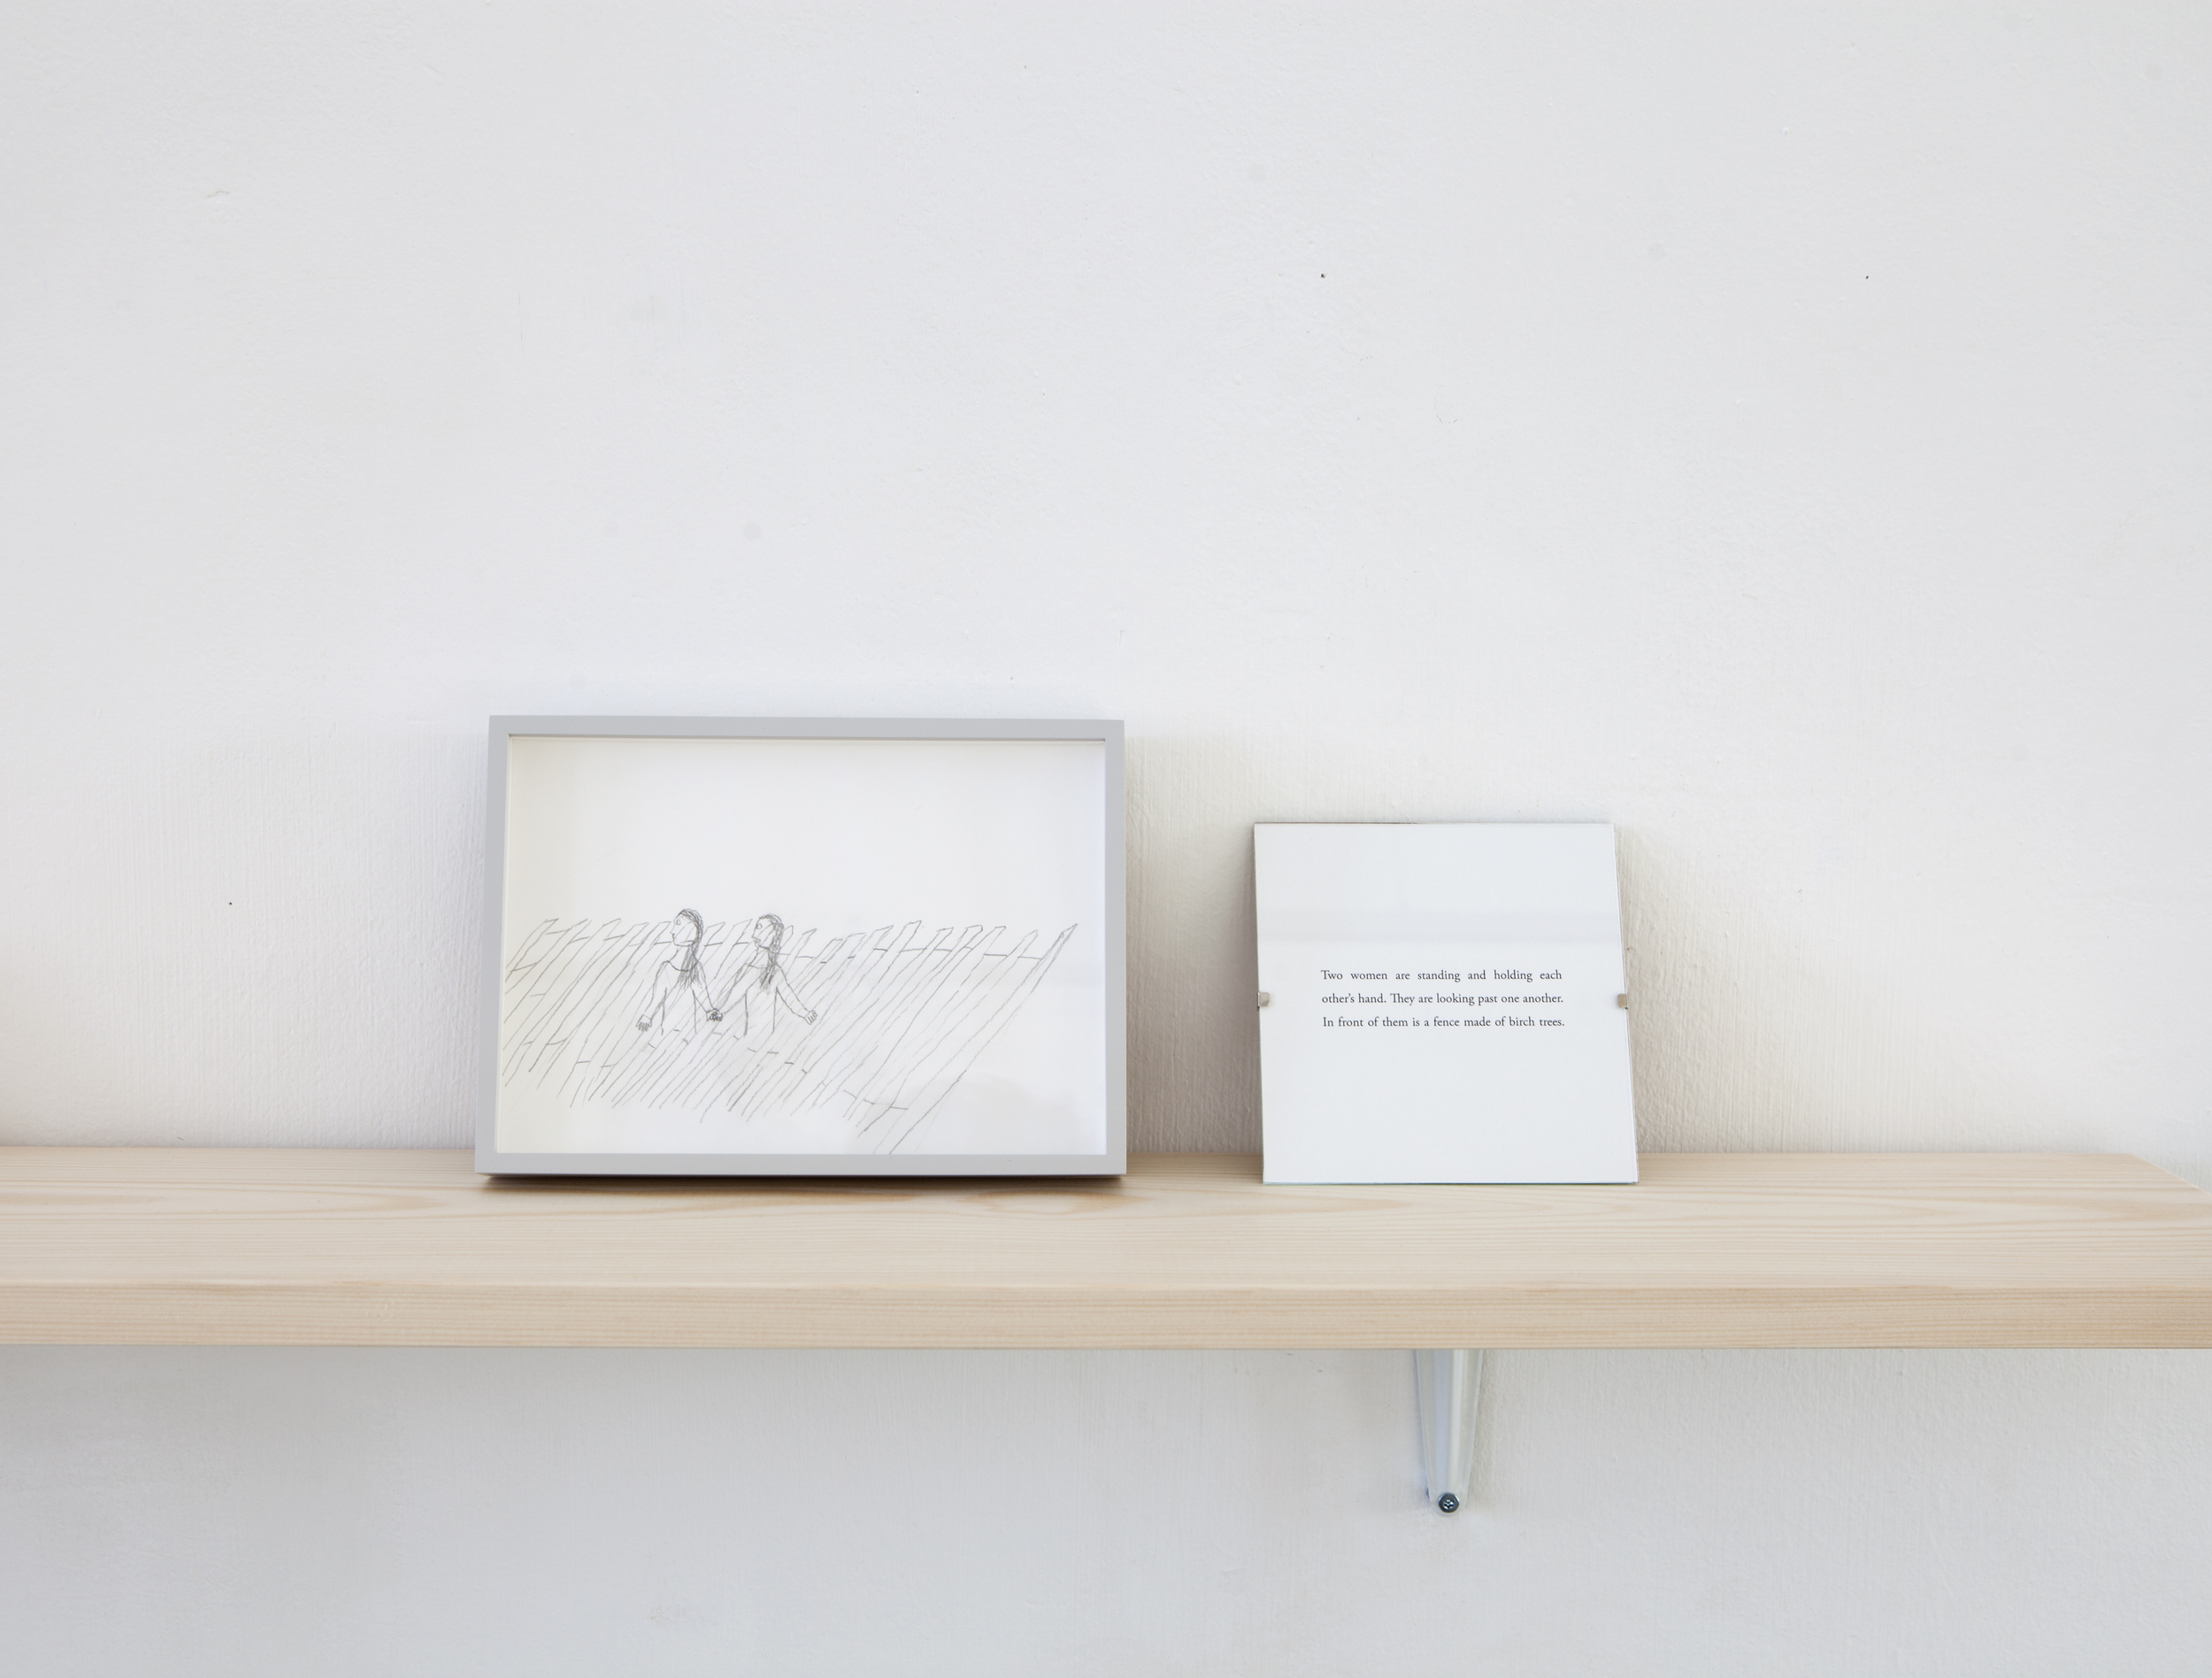 Jonna Kina,   Translations   (2015),Pencil on paper, 15.5 x 21.7cm, framed